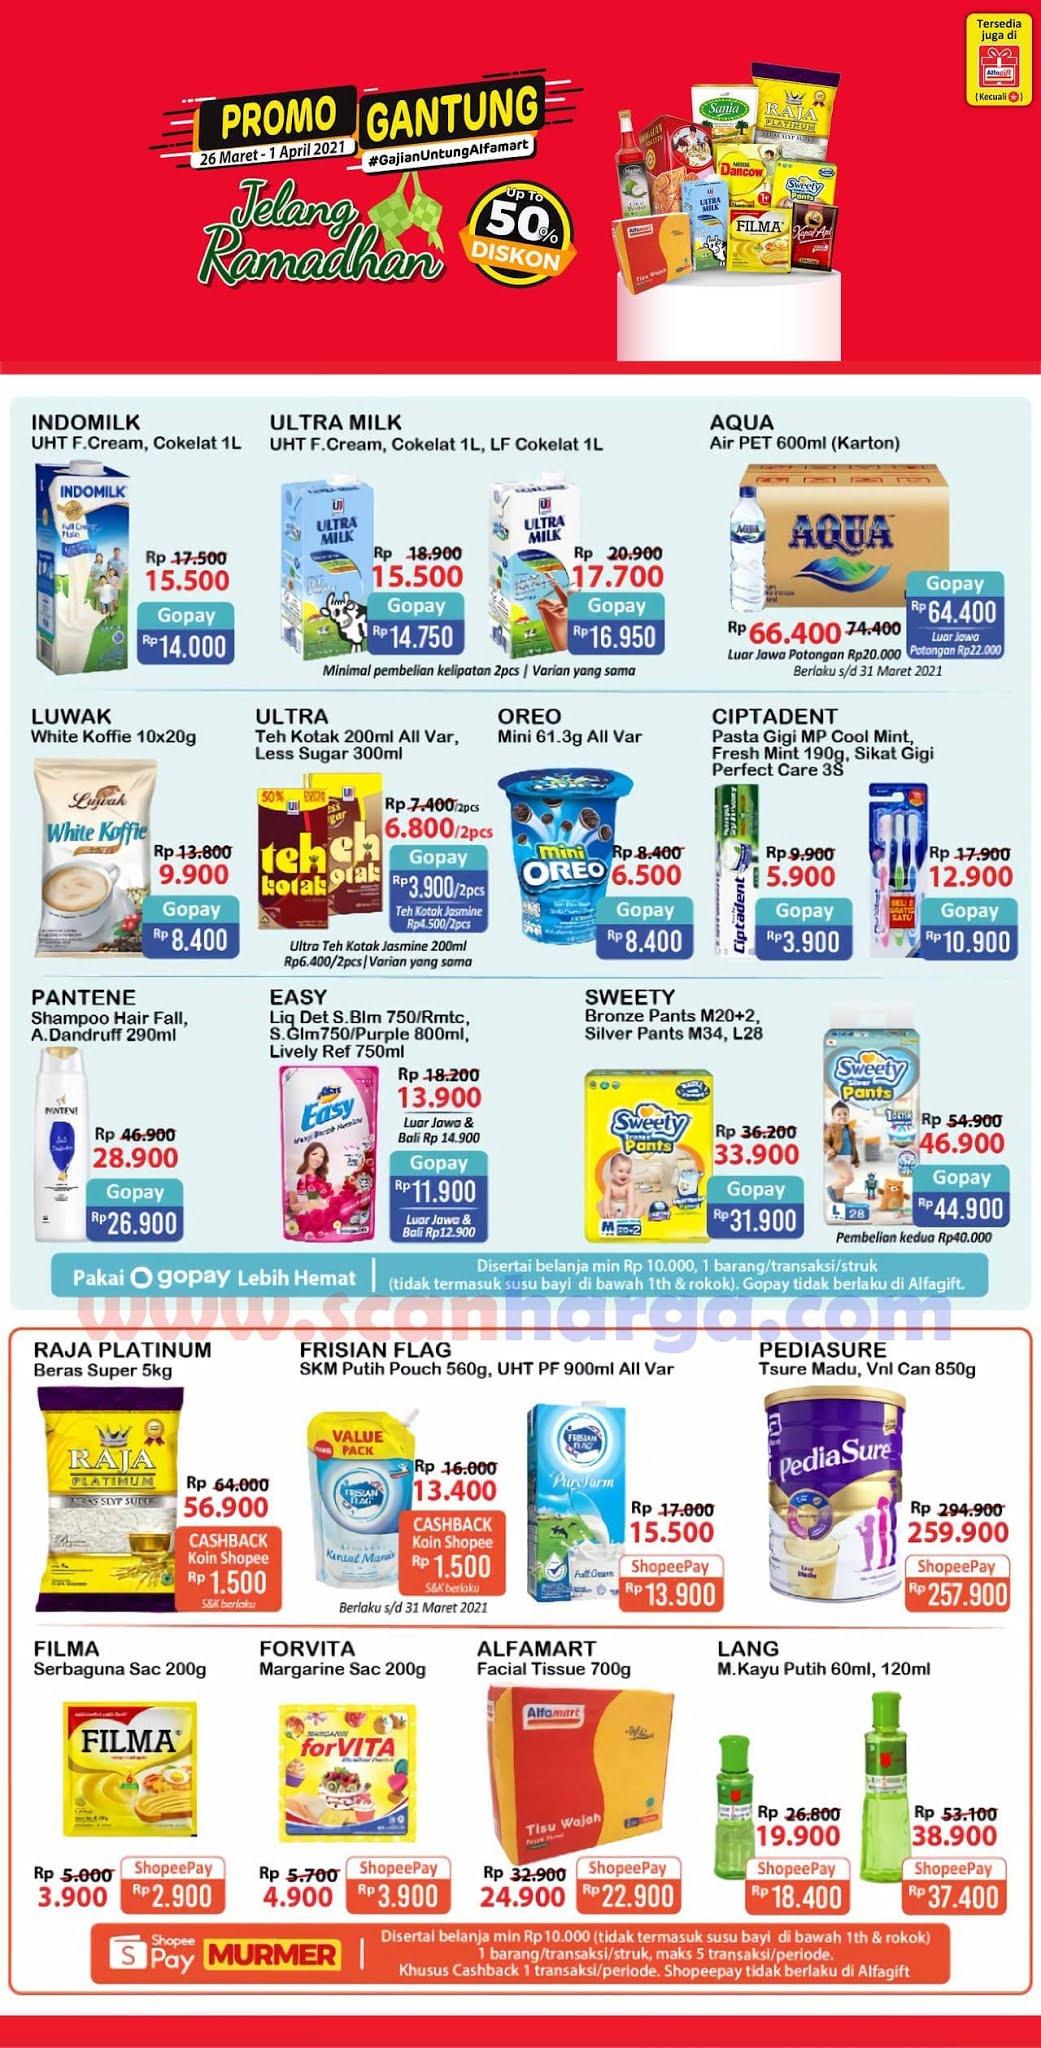 Katalog Promo Alfamart Gajian Untung (Gantung) 26 Maret - 1 April 2021 1